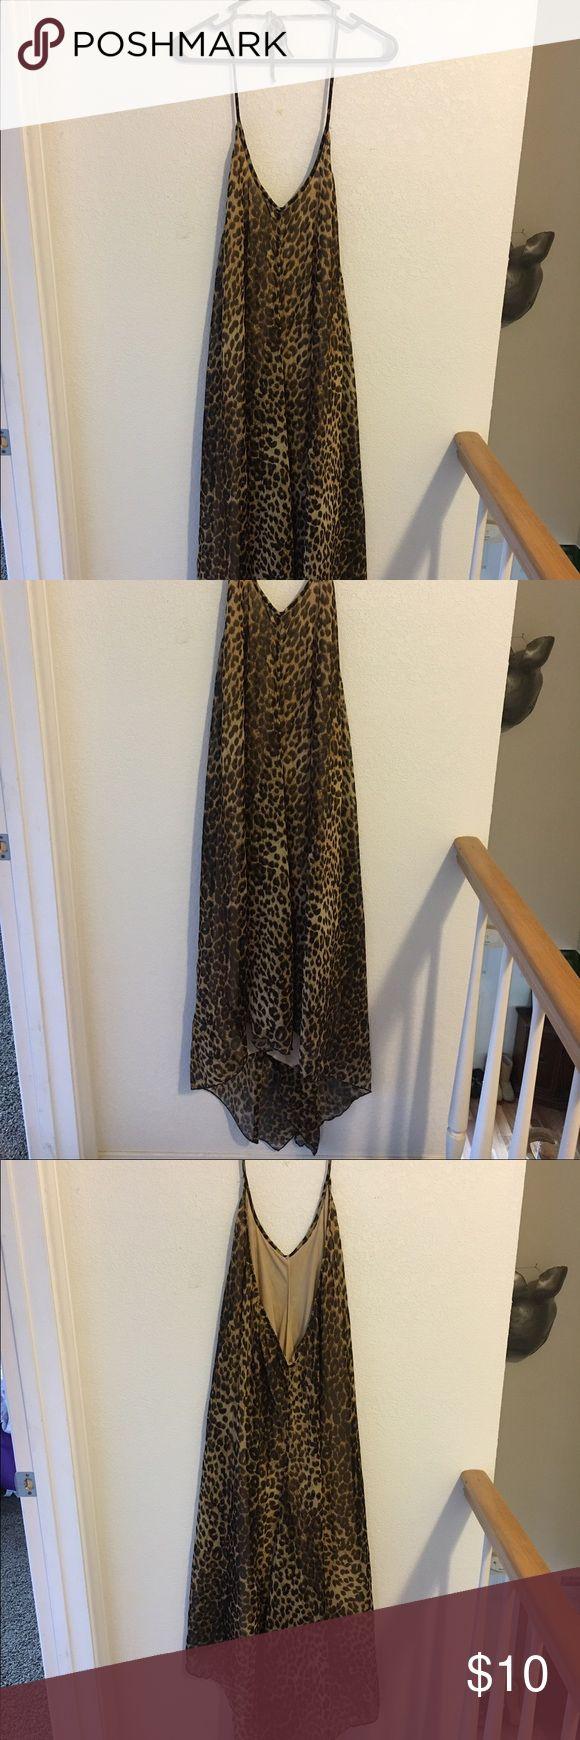 Leopard maxi dress Very flowy leopard maxi halter dress. Size L. Open back. Very comfortable resort wear. Dresses Maxi